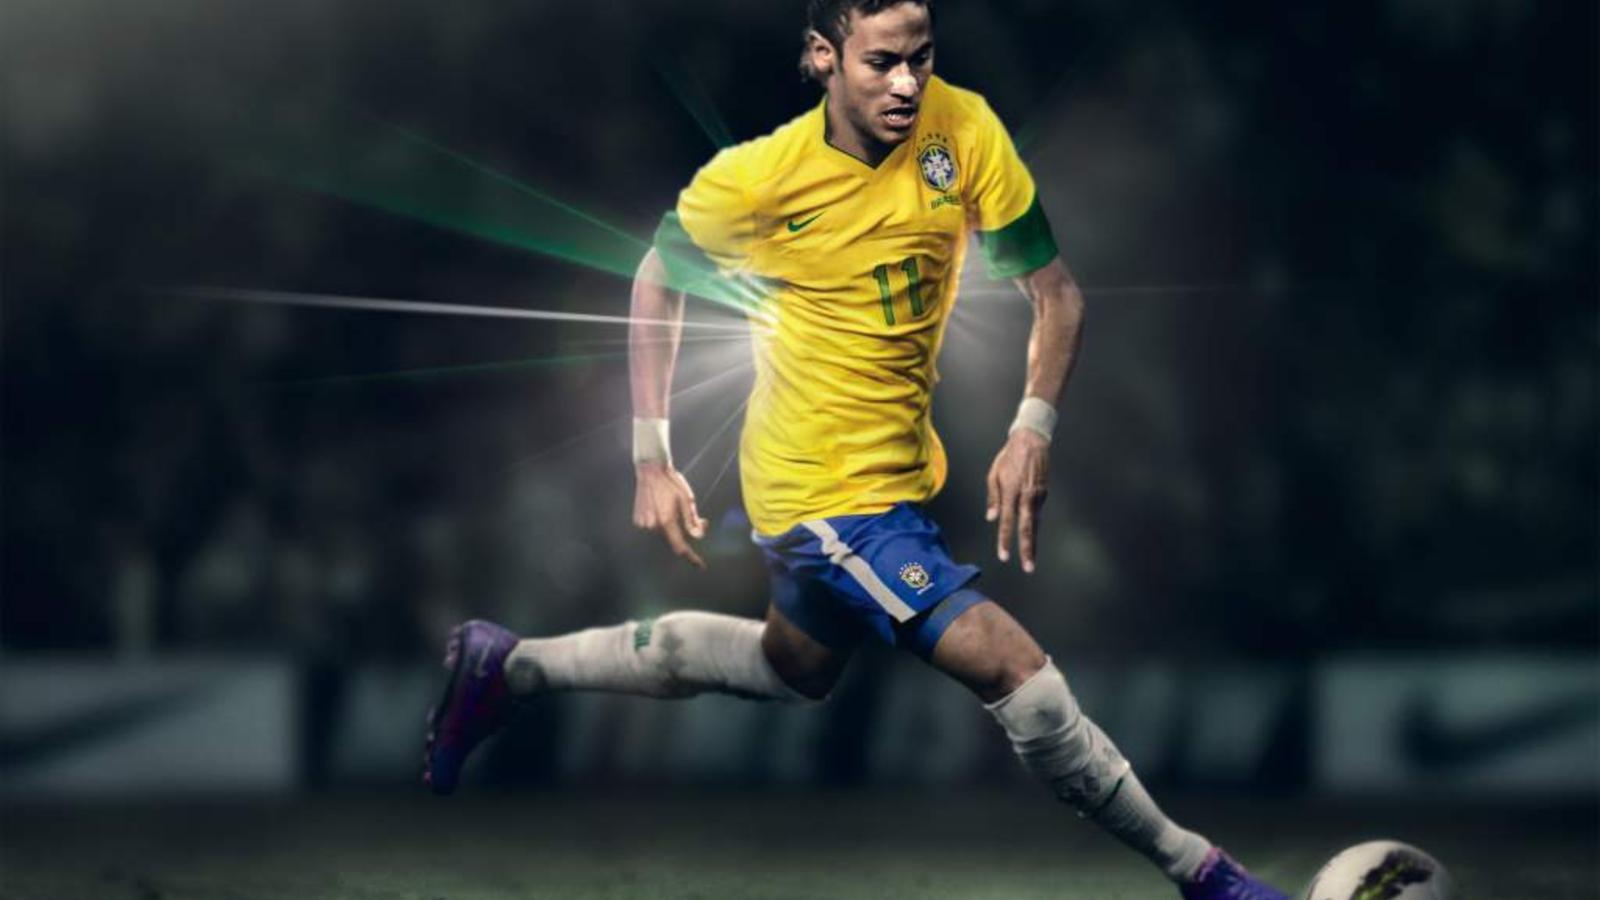 Brasil_2012_Home_Kit_Neymar_2